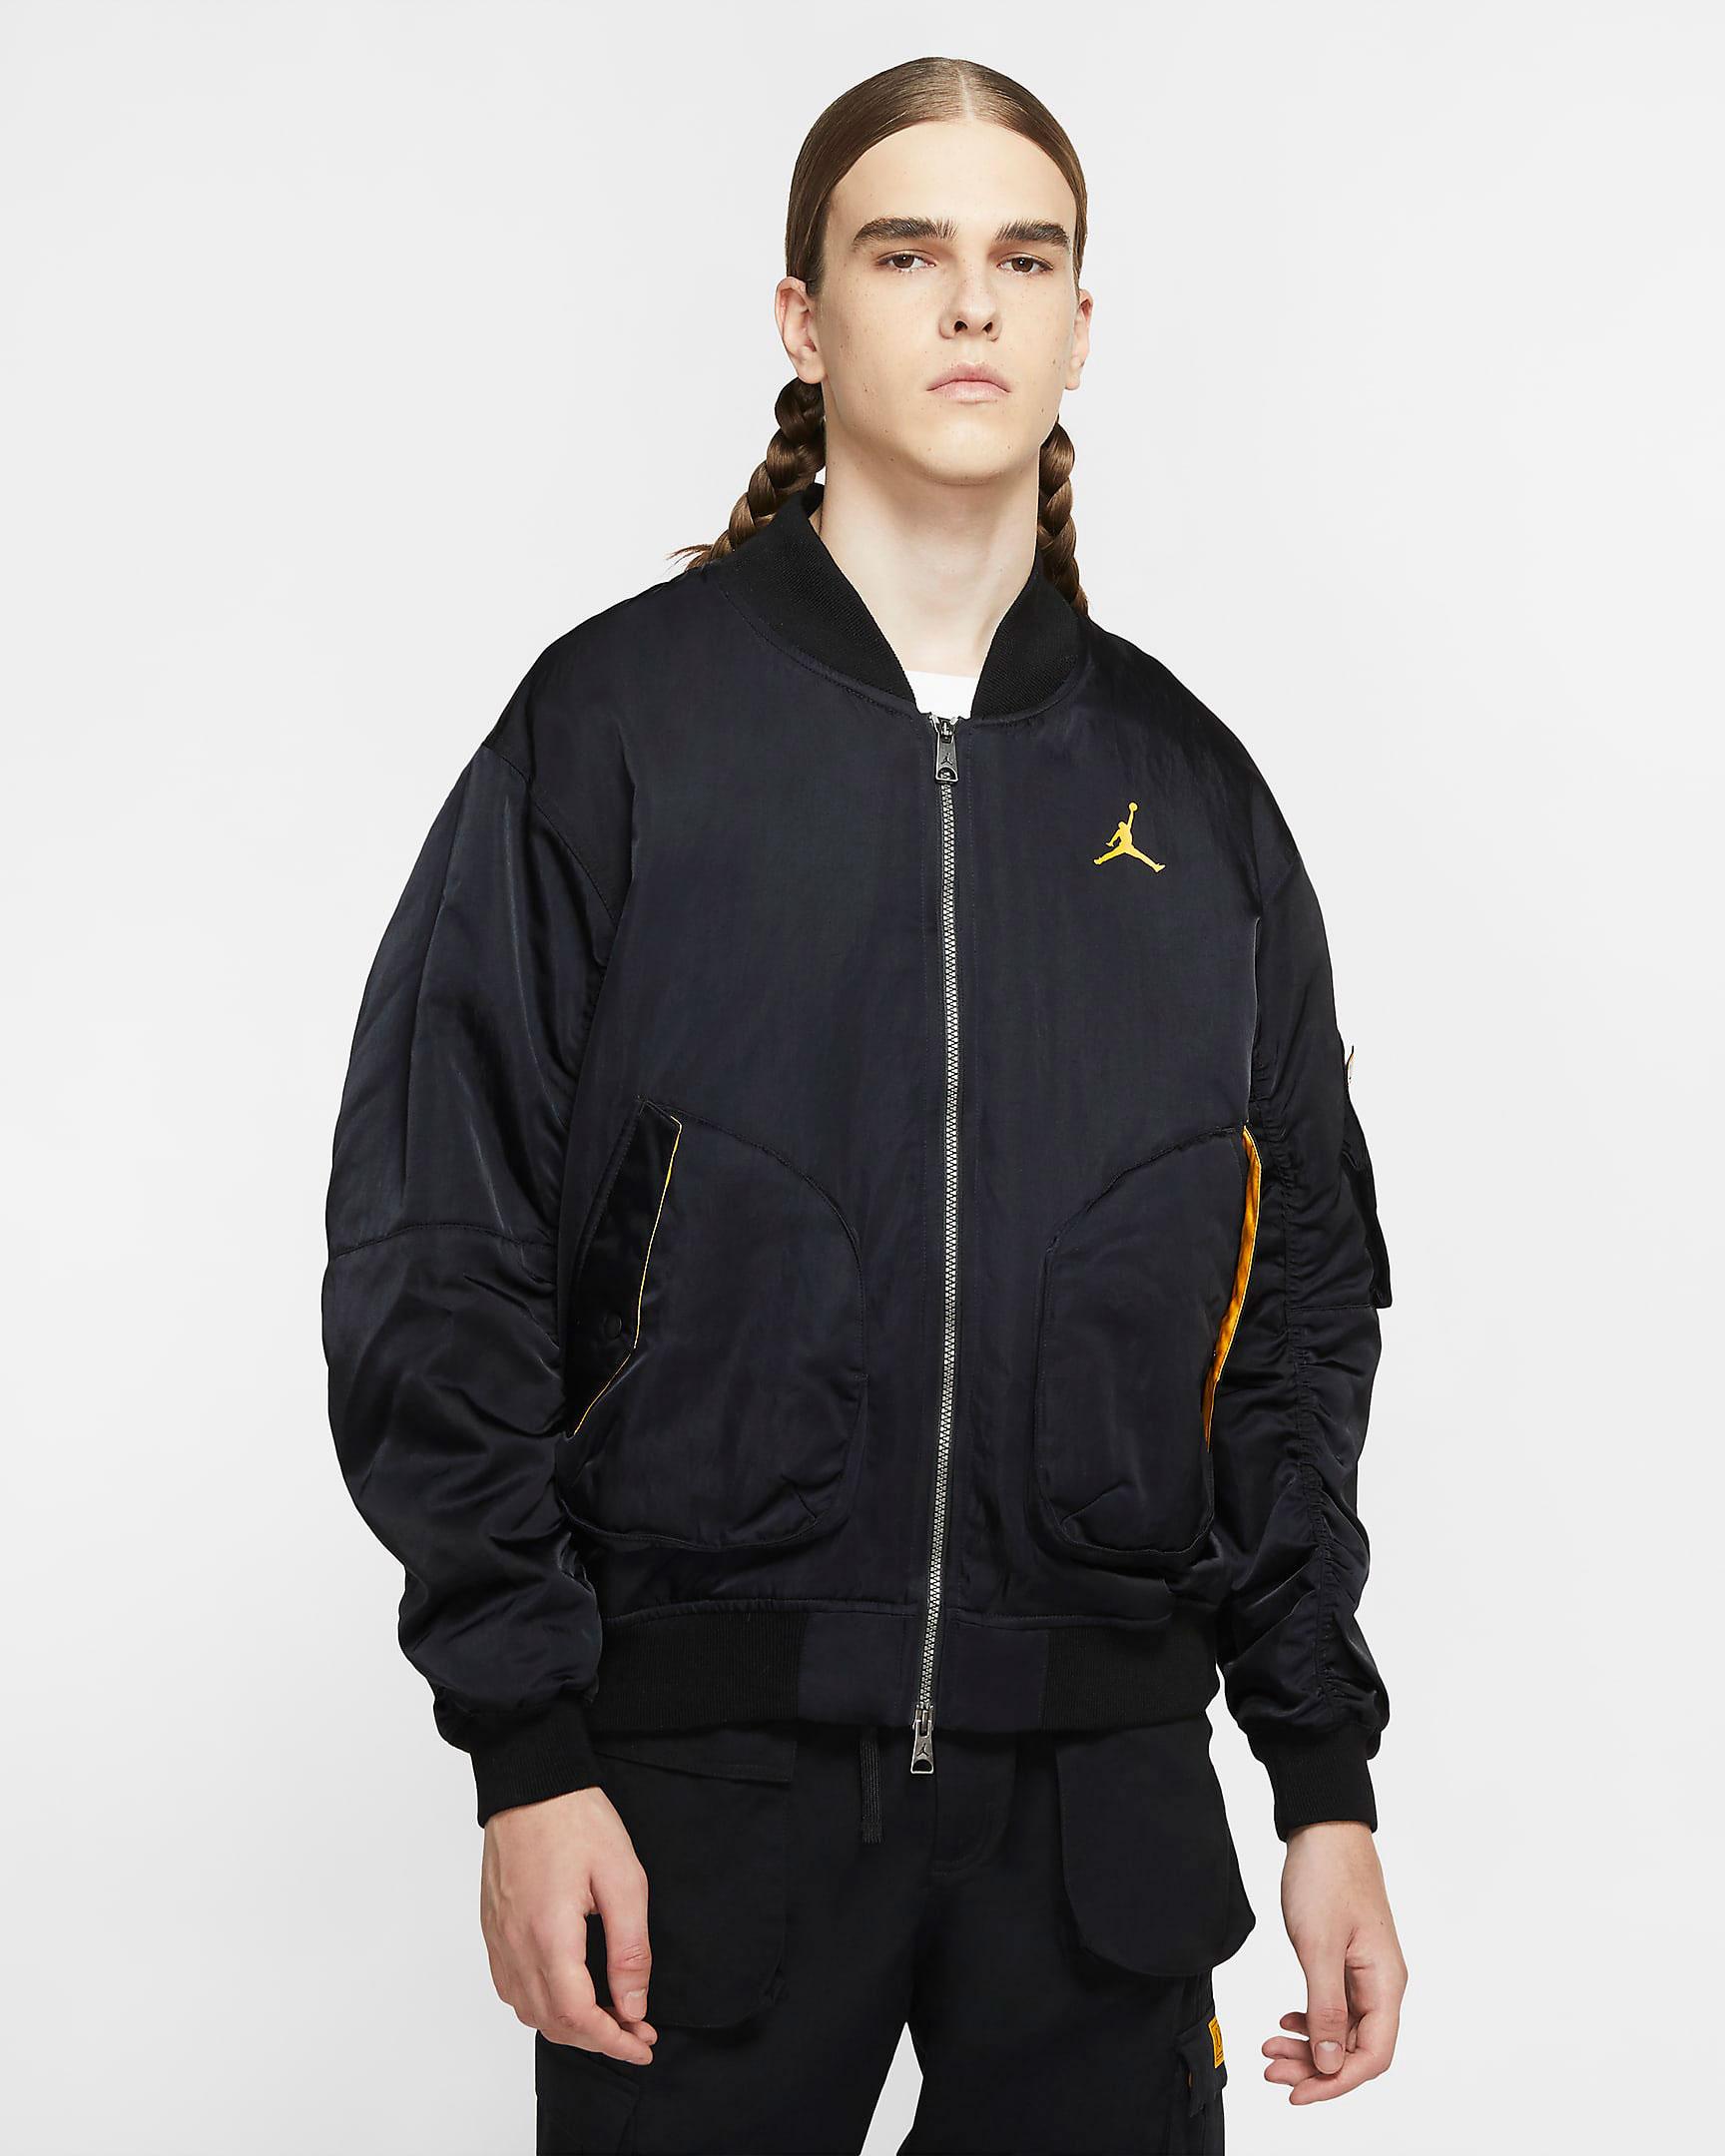 air-jordan-9-university-gold-black-bomber-jacket